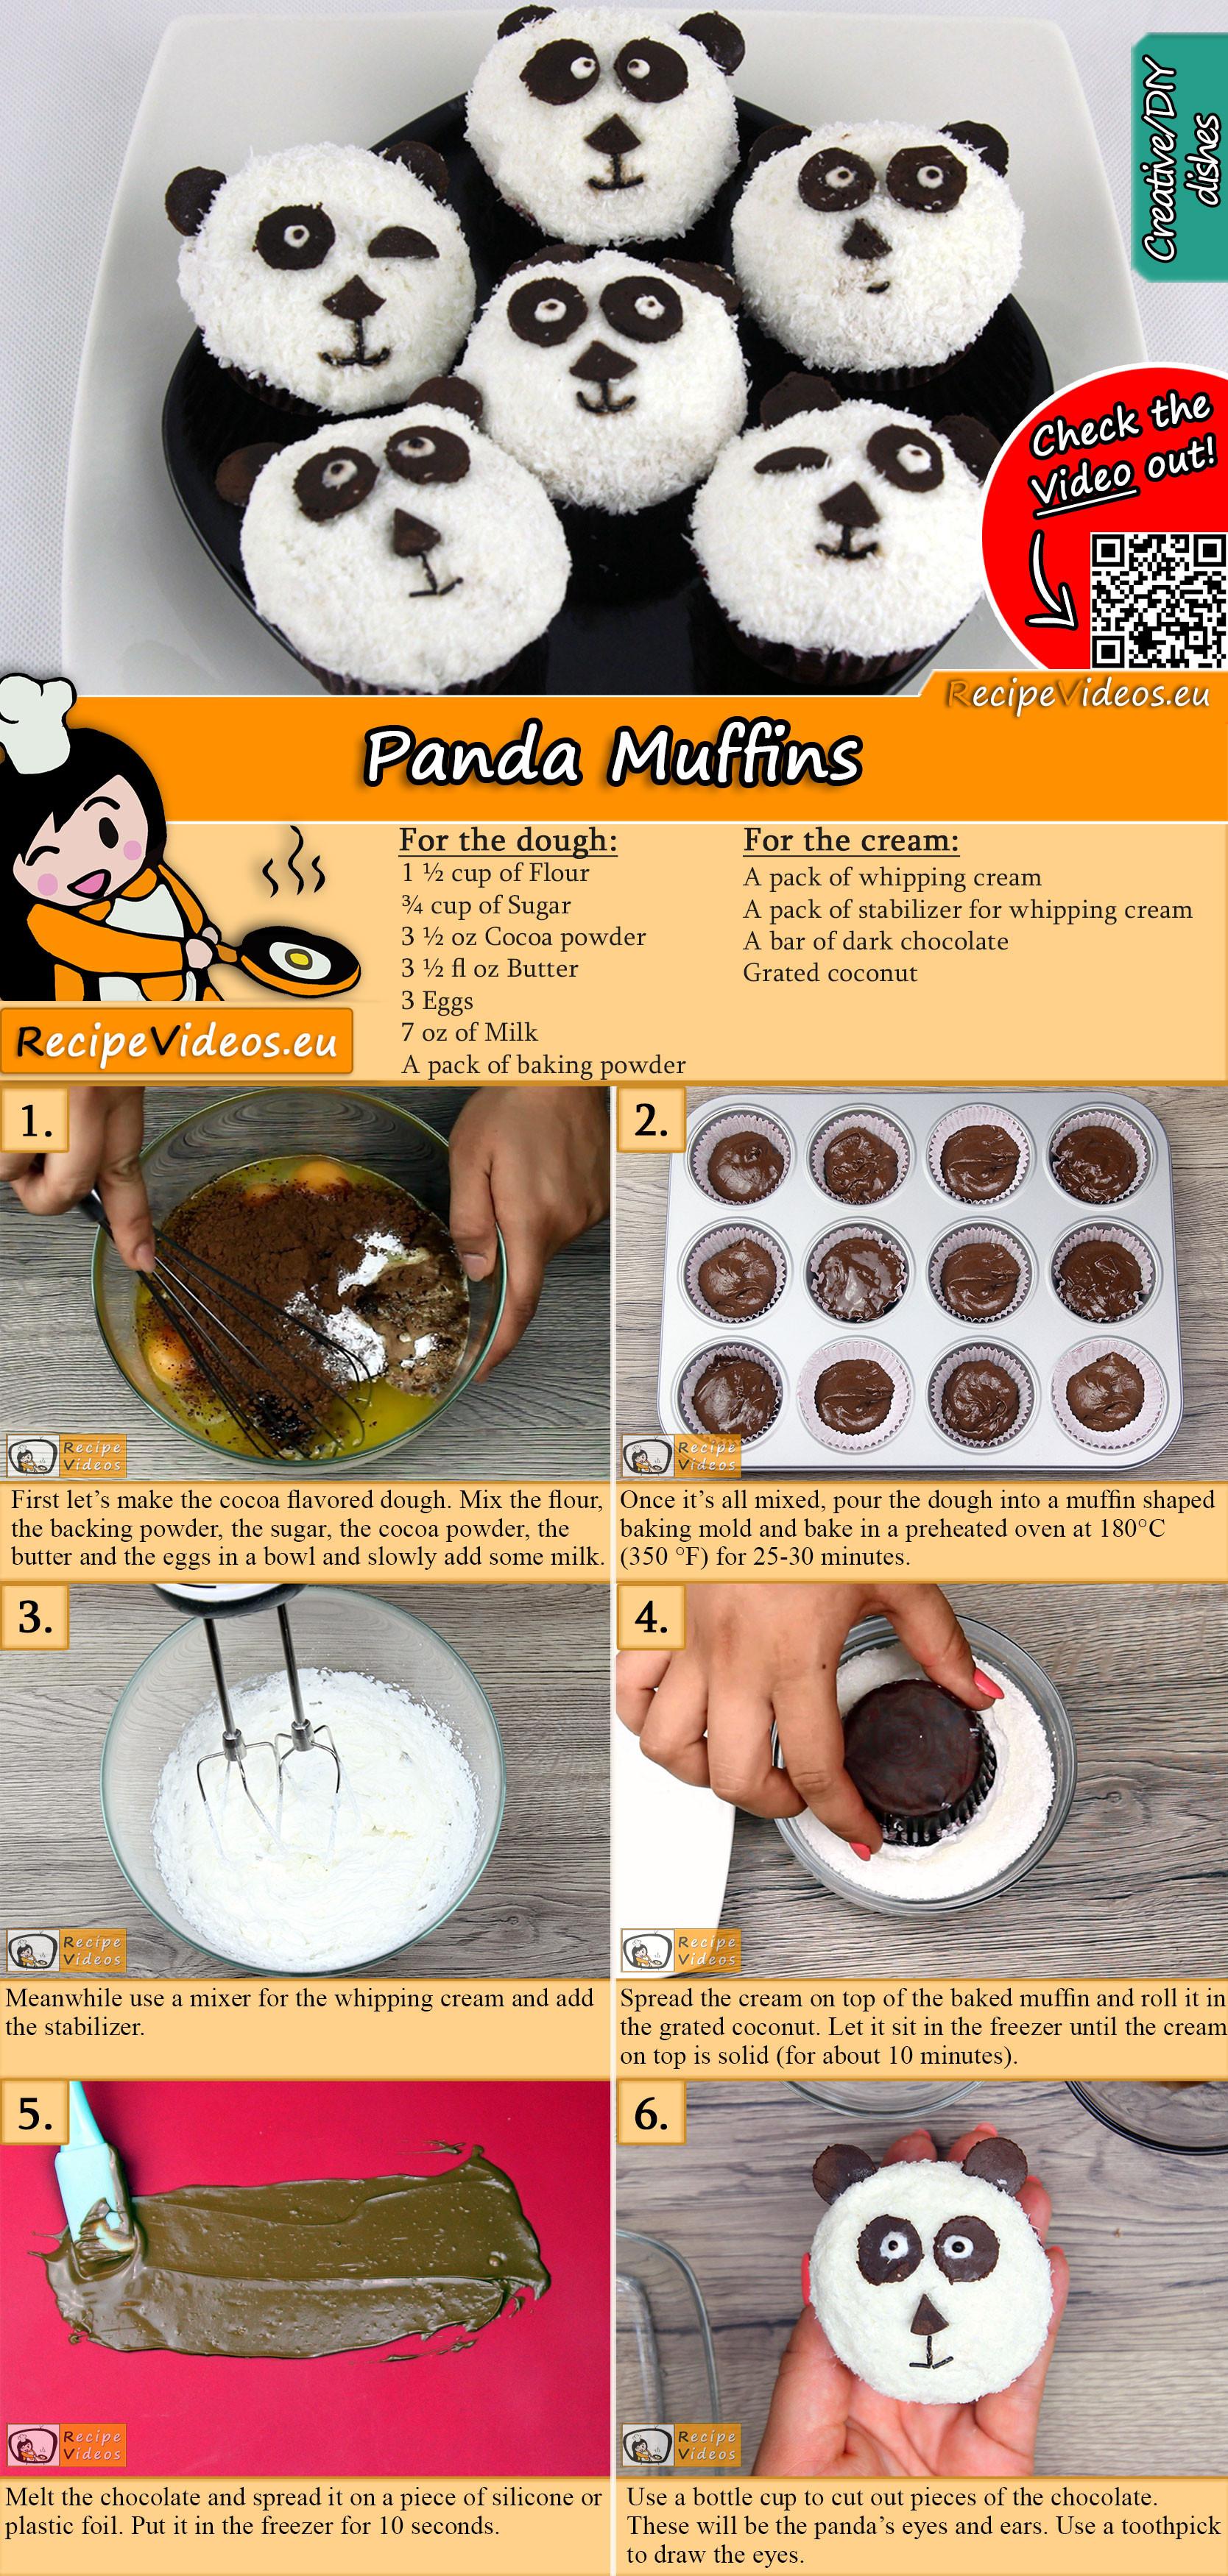 Panda muffins recipe with video